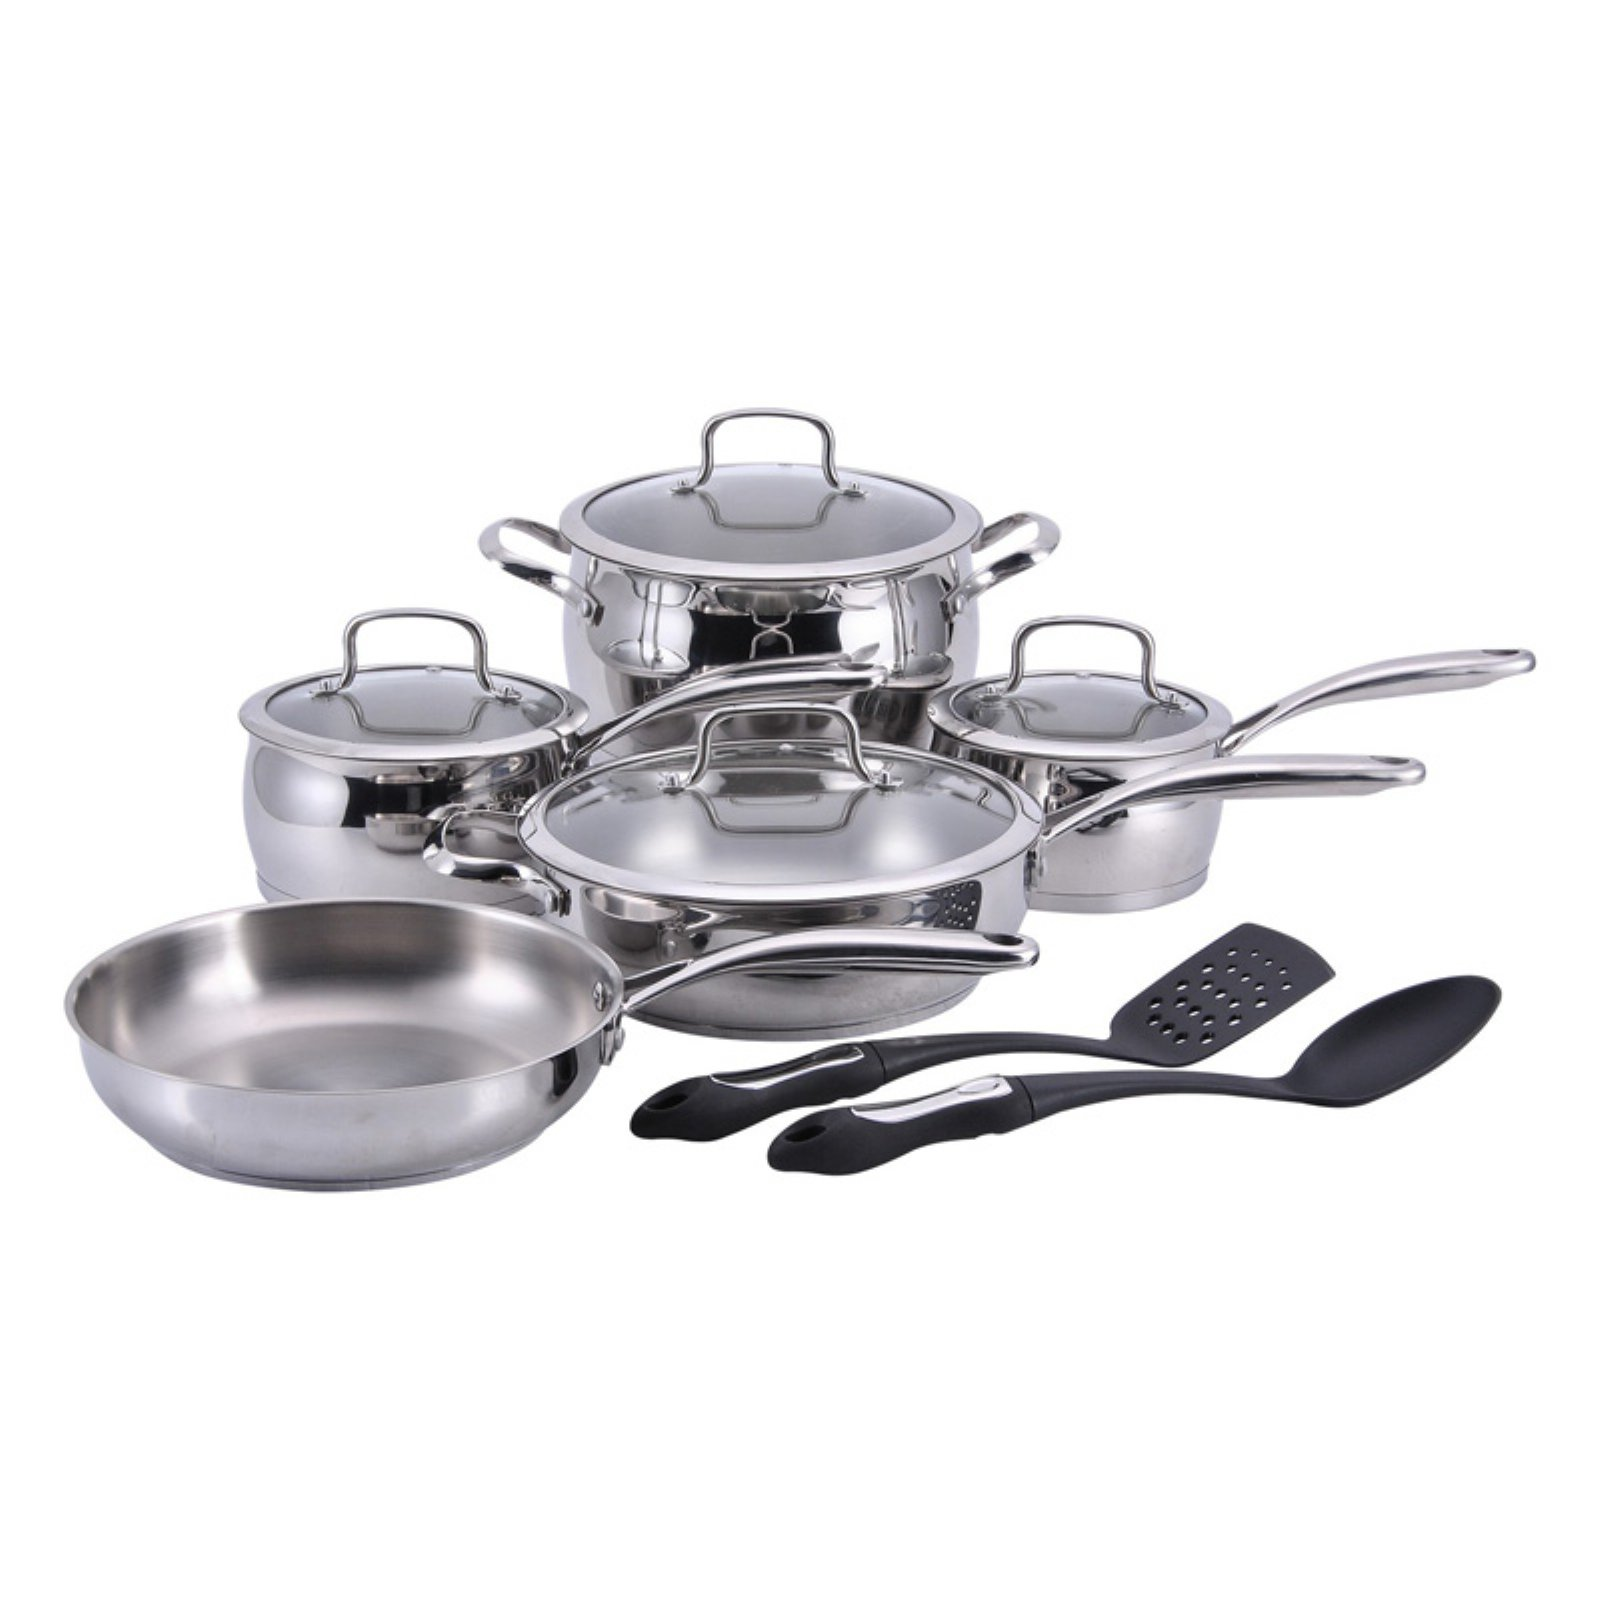 Hamilton Beach  11-Piece Stainless Steel Cookware Set